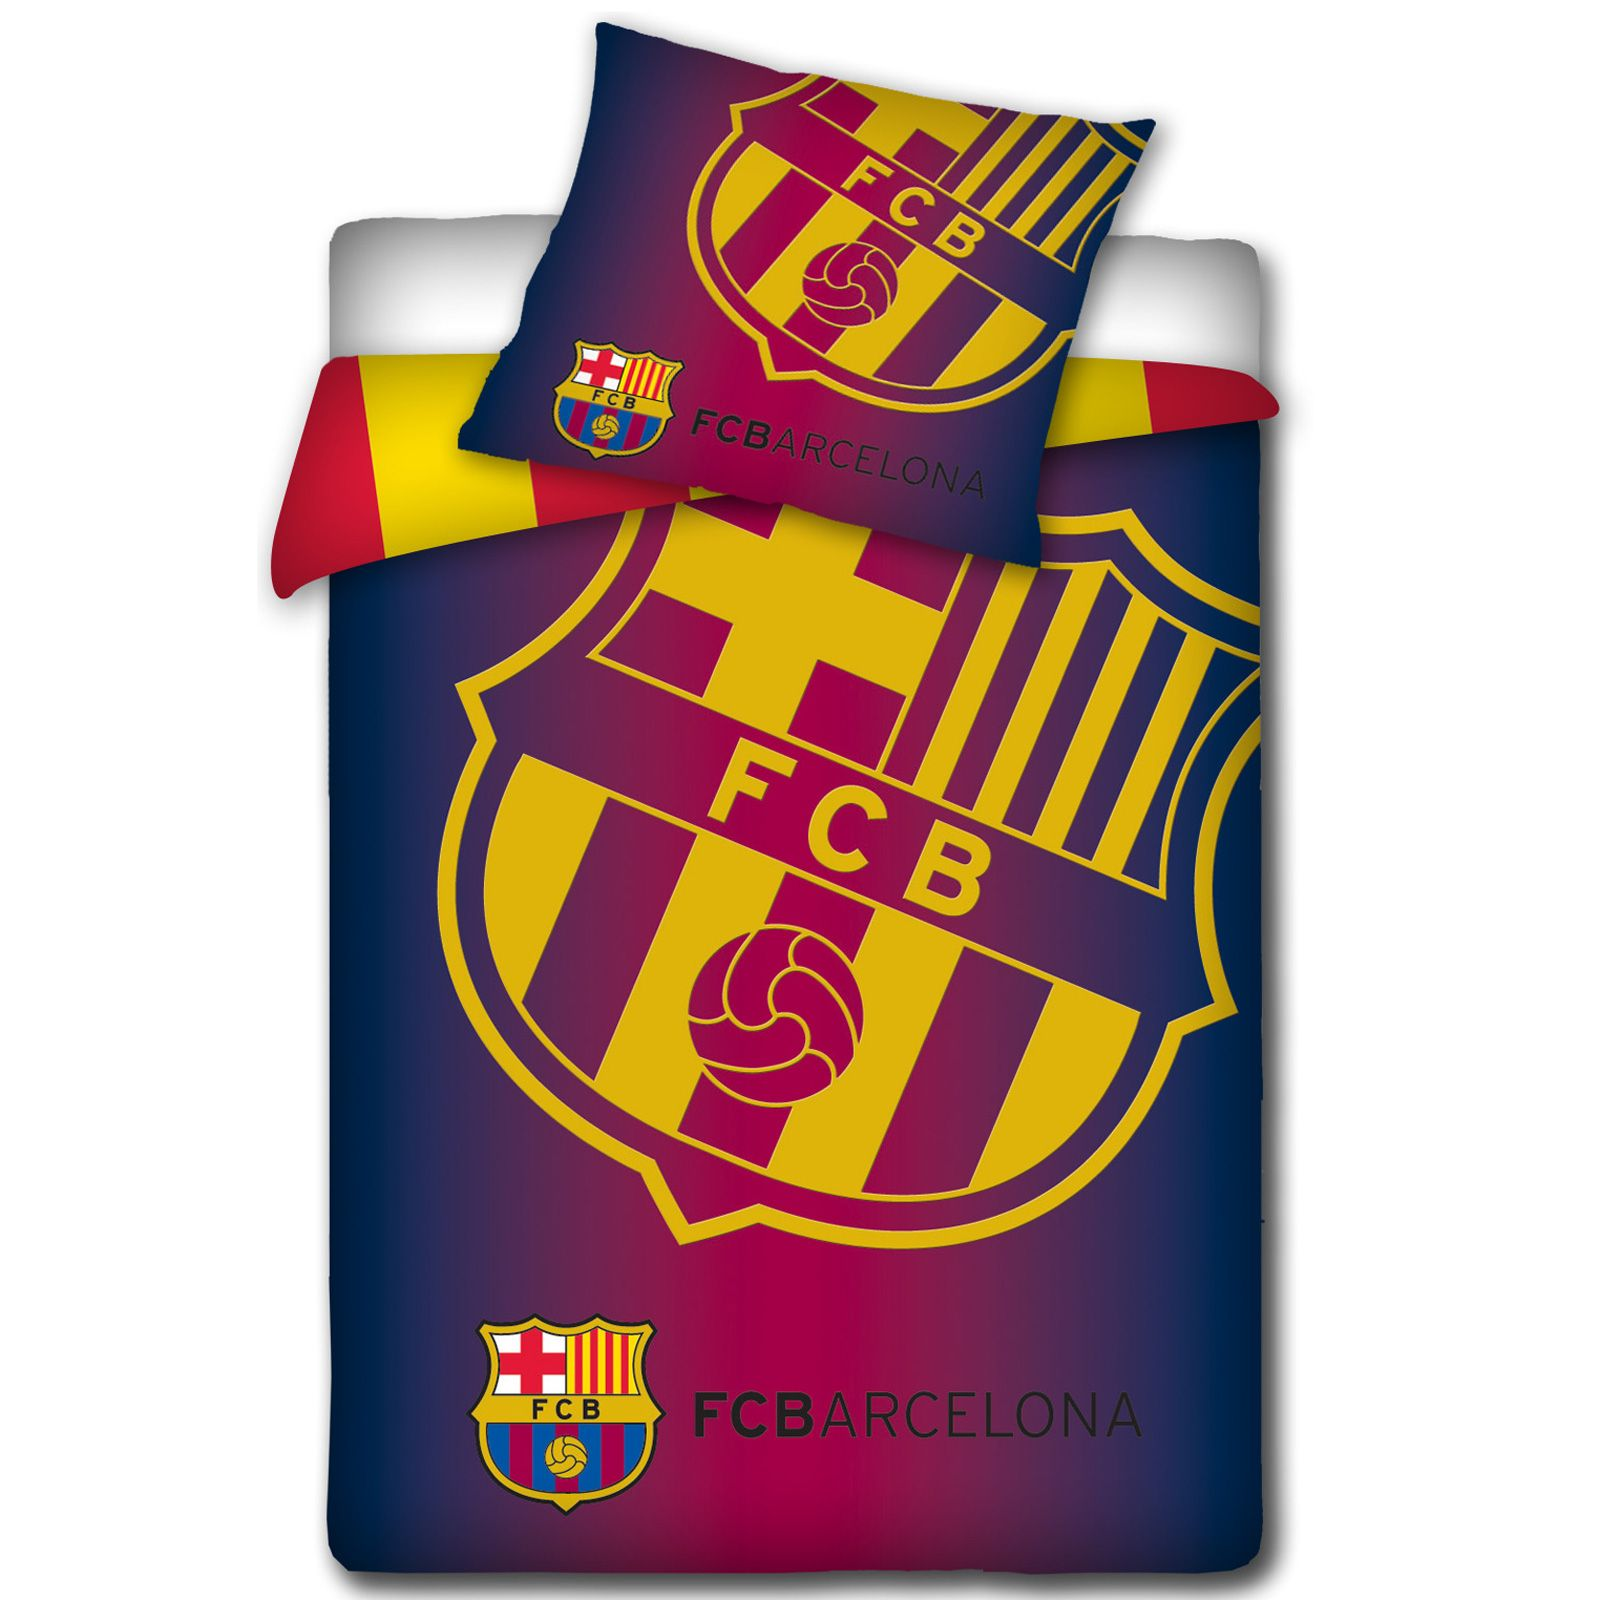 OFFICIAL FC BARCELONA DUVET COVER SETS BEDDING BEDROOM. OFFICIAL FC BARCELONA DUVET COVER SETS BEDDING BEDROOM FOOTBALL